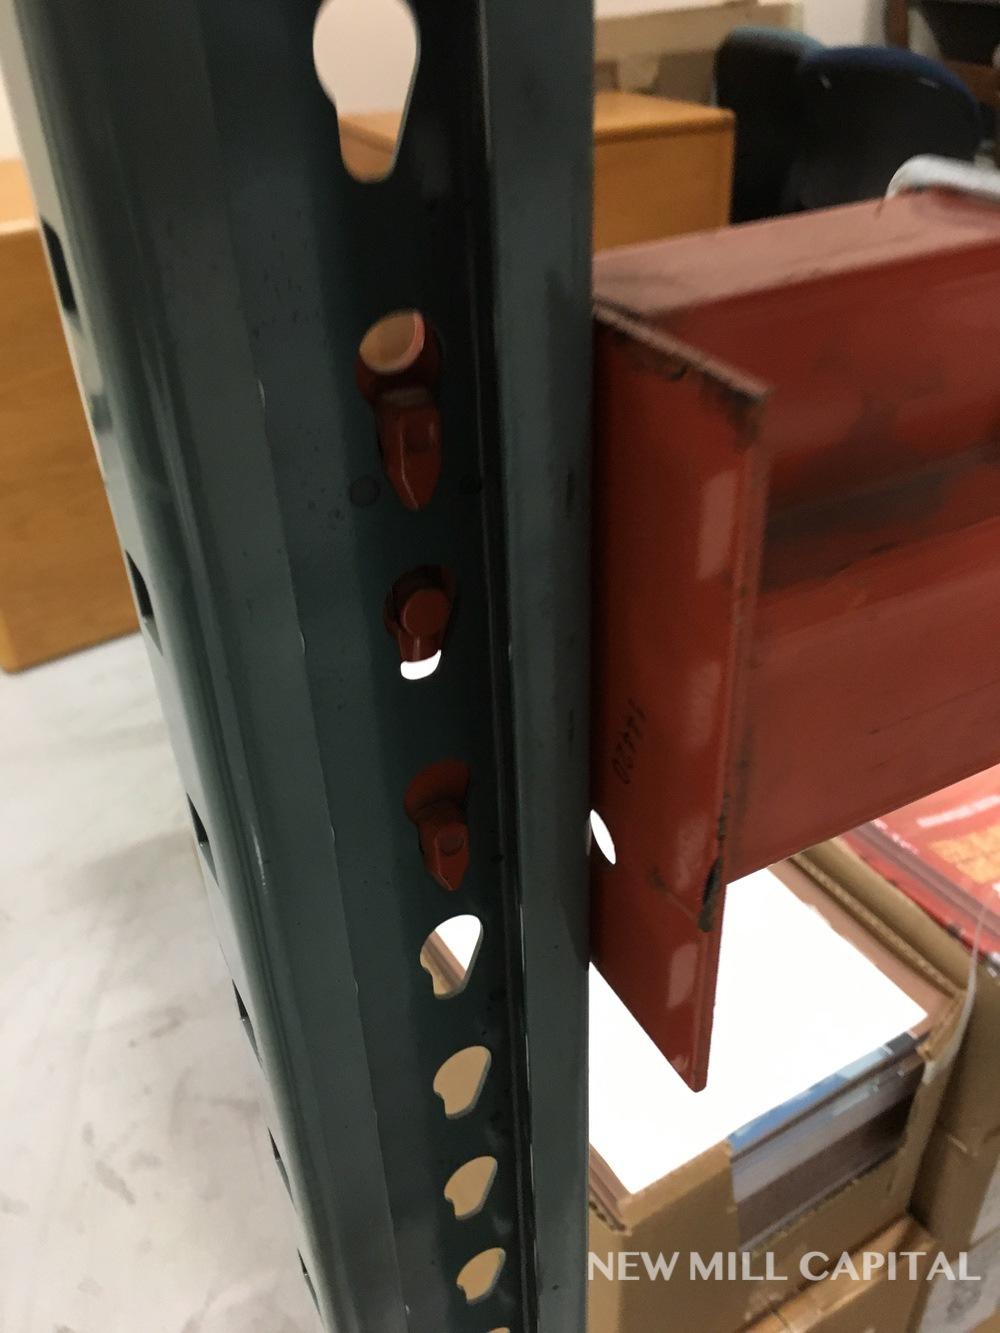 Lot 31 - Interlake Teardrop Pallet Rack, (8) Uprights (3in x 1.625in Columns, 42in | Rig: See Lot Description